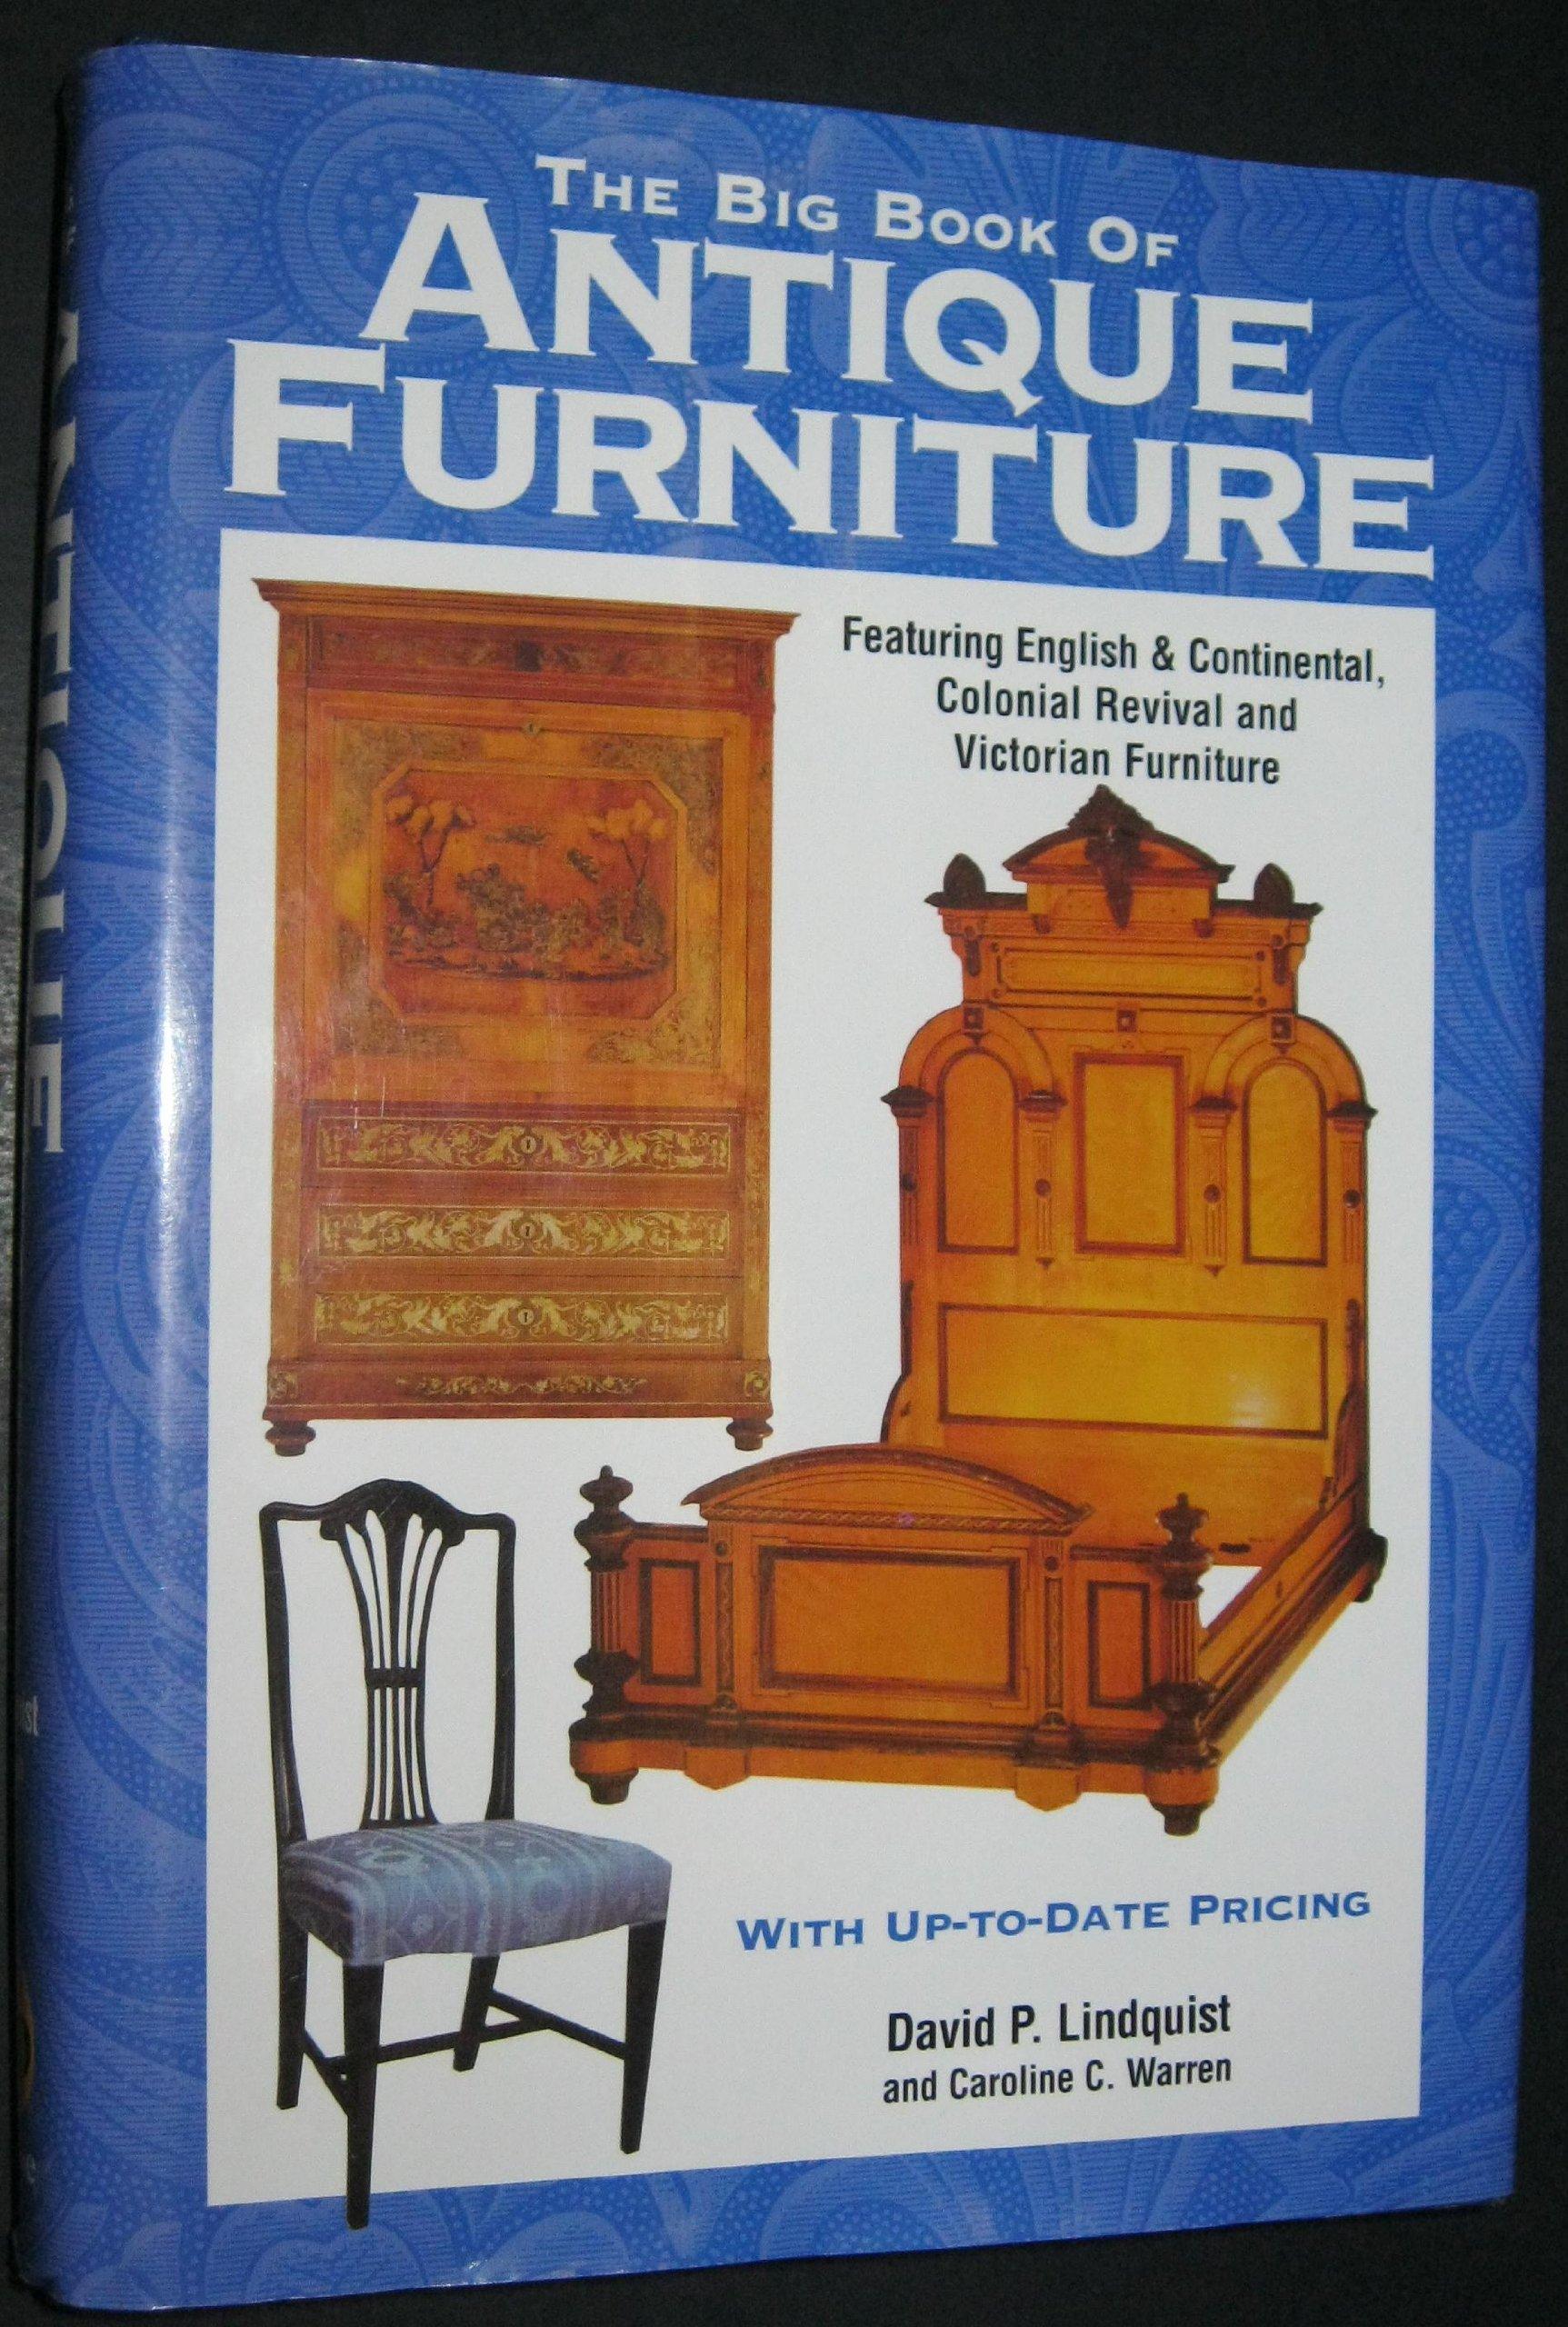 The Big Book Of Antique Furniture: Caroline C. Warren David P. Lindquist:  9780873495691: Amazon.com: Books